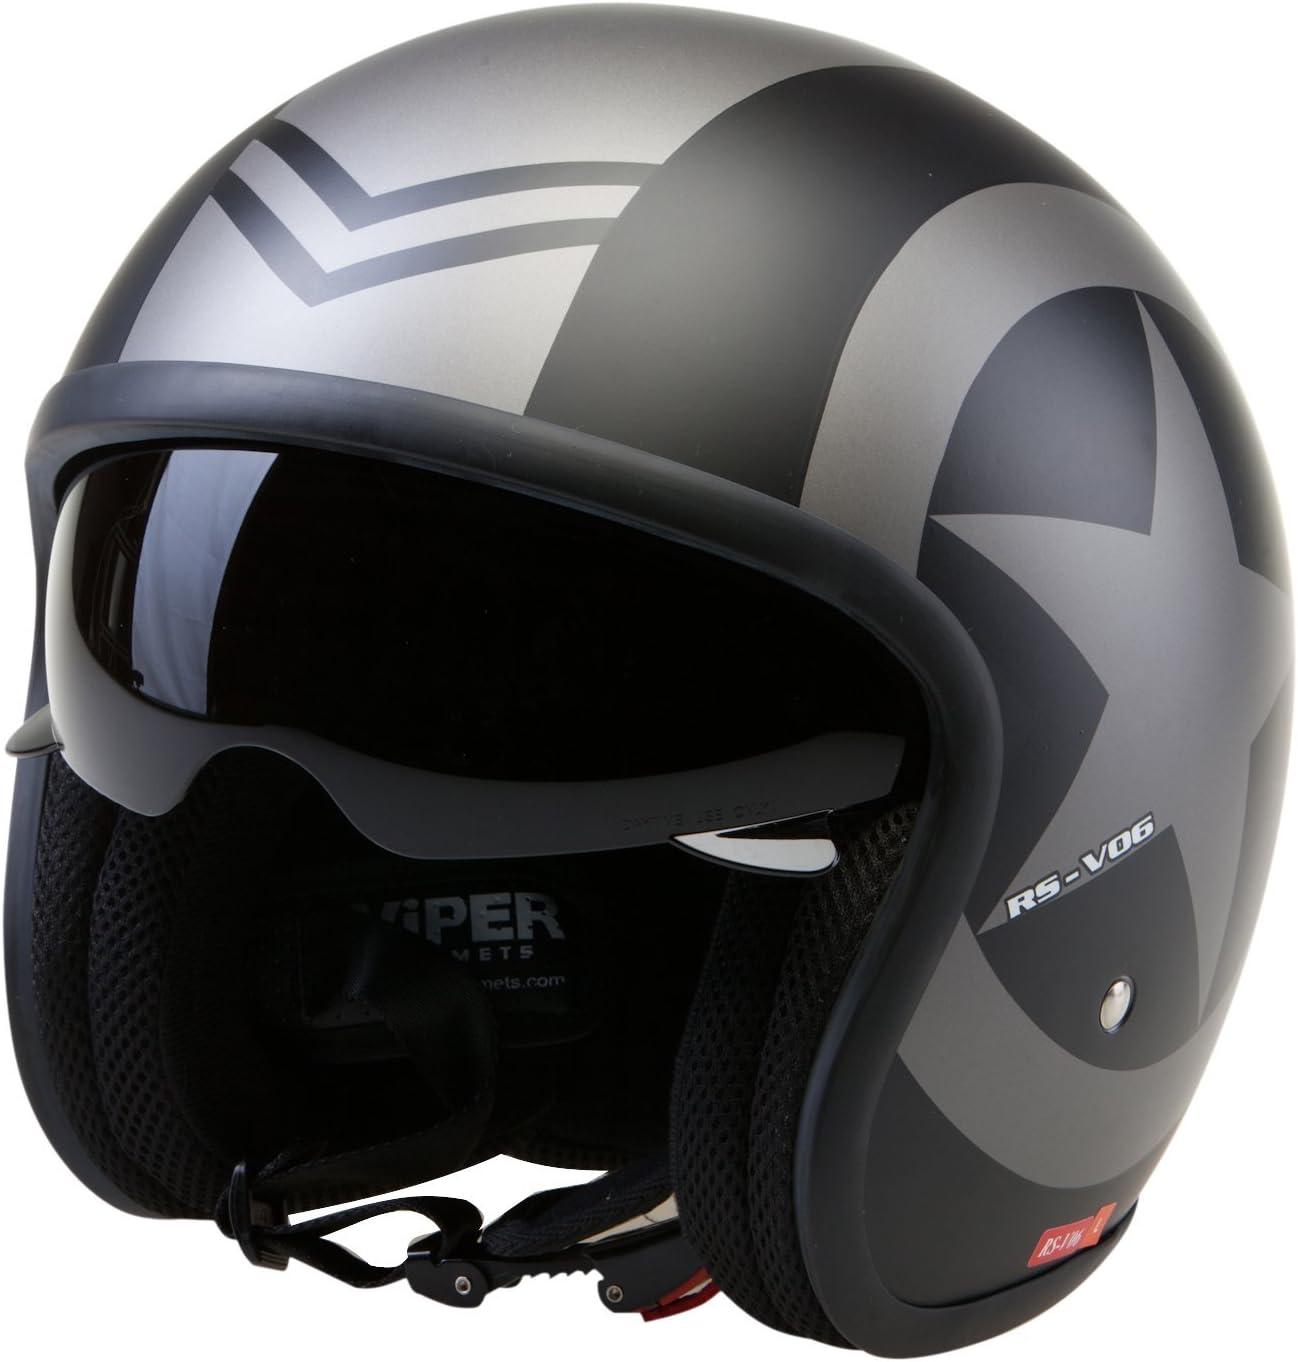 Viper RSV06 Casque de moto ouvert 57-58 cm noir opaque